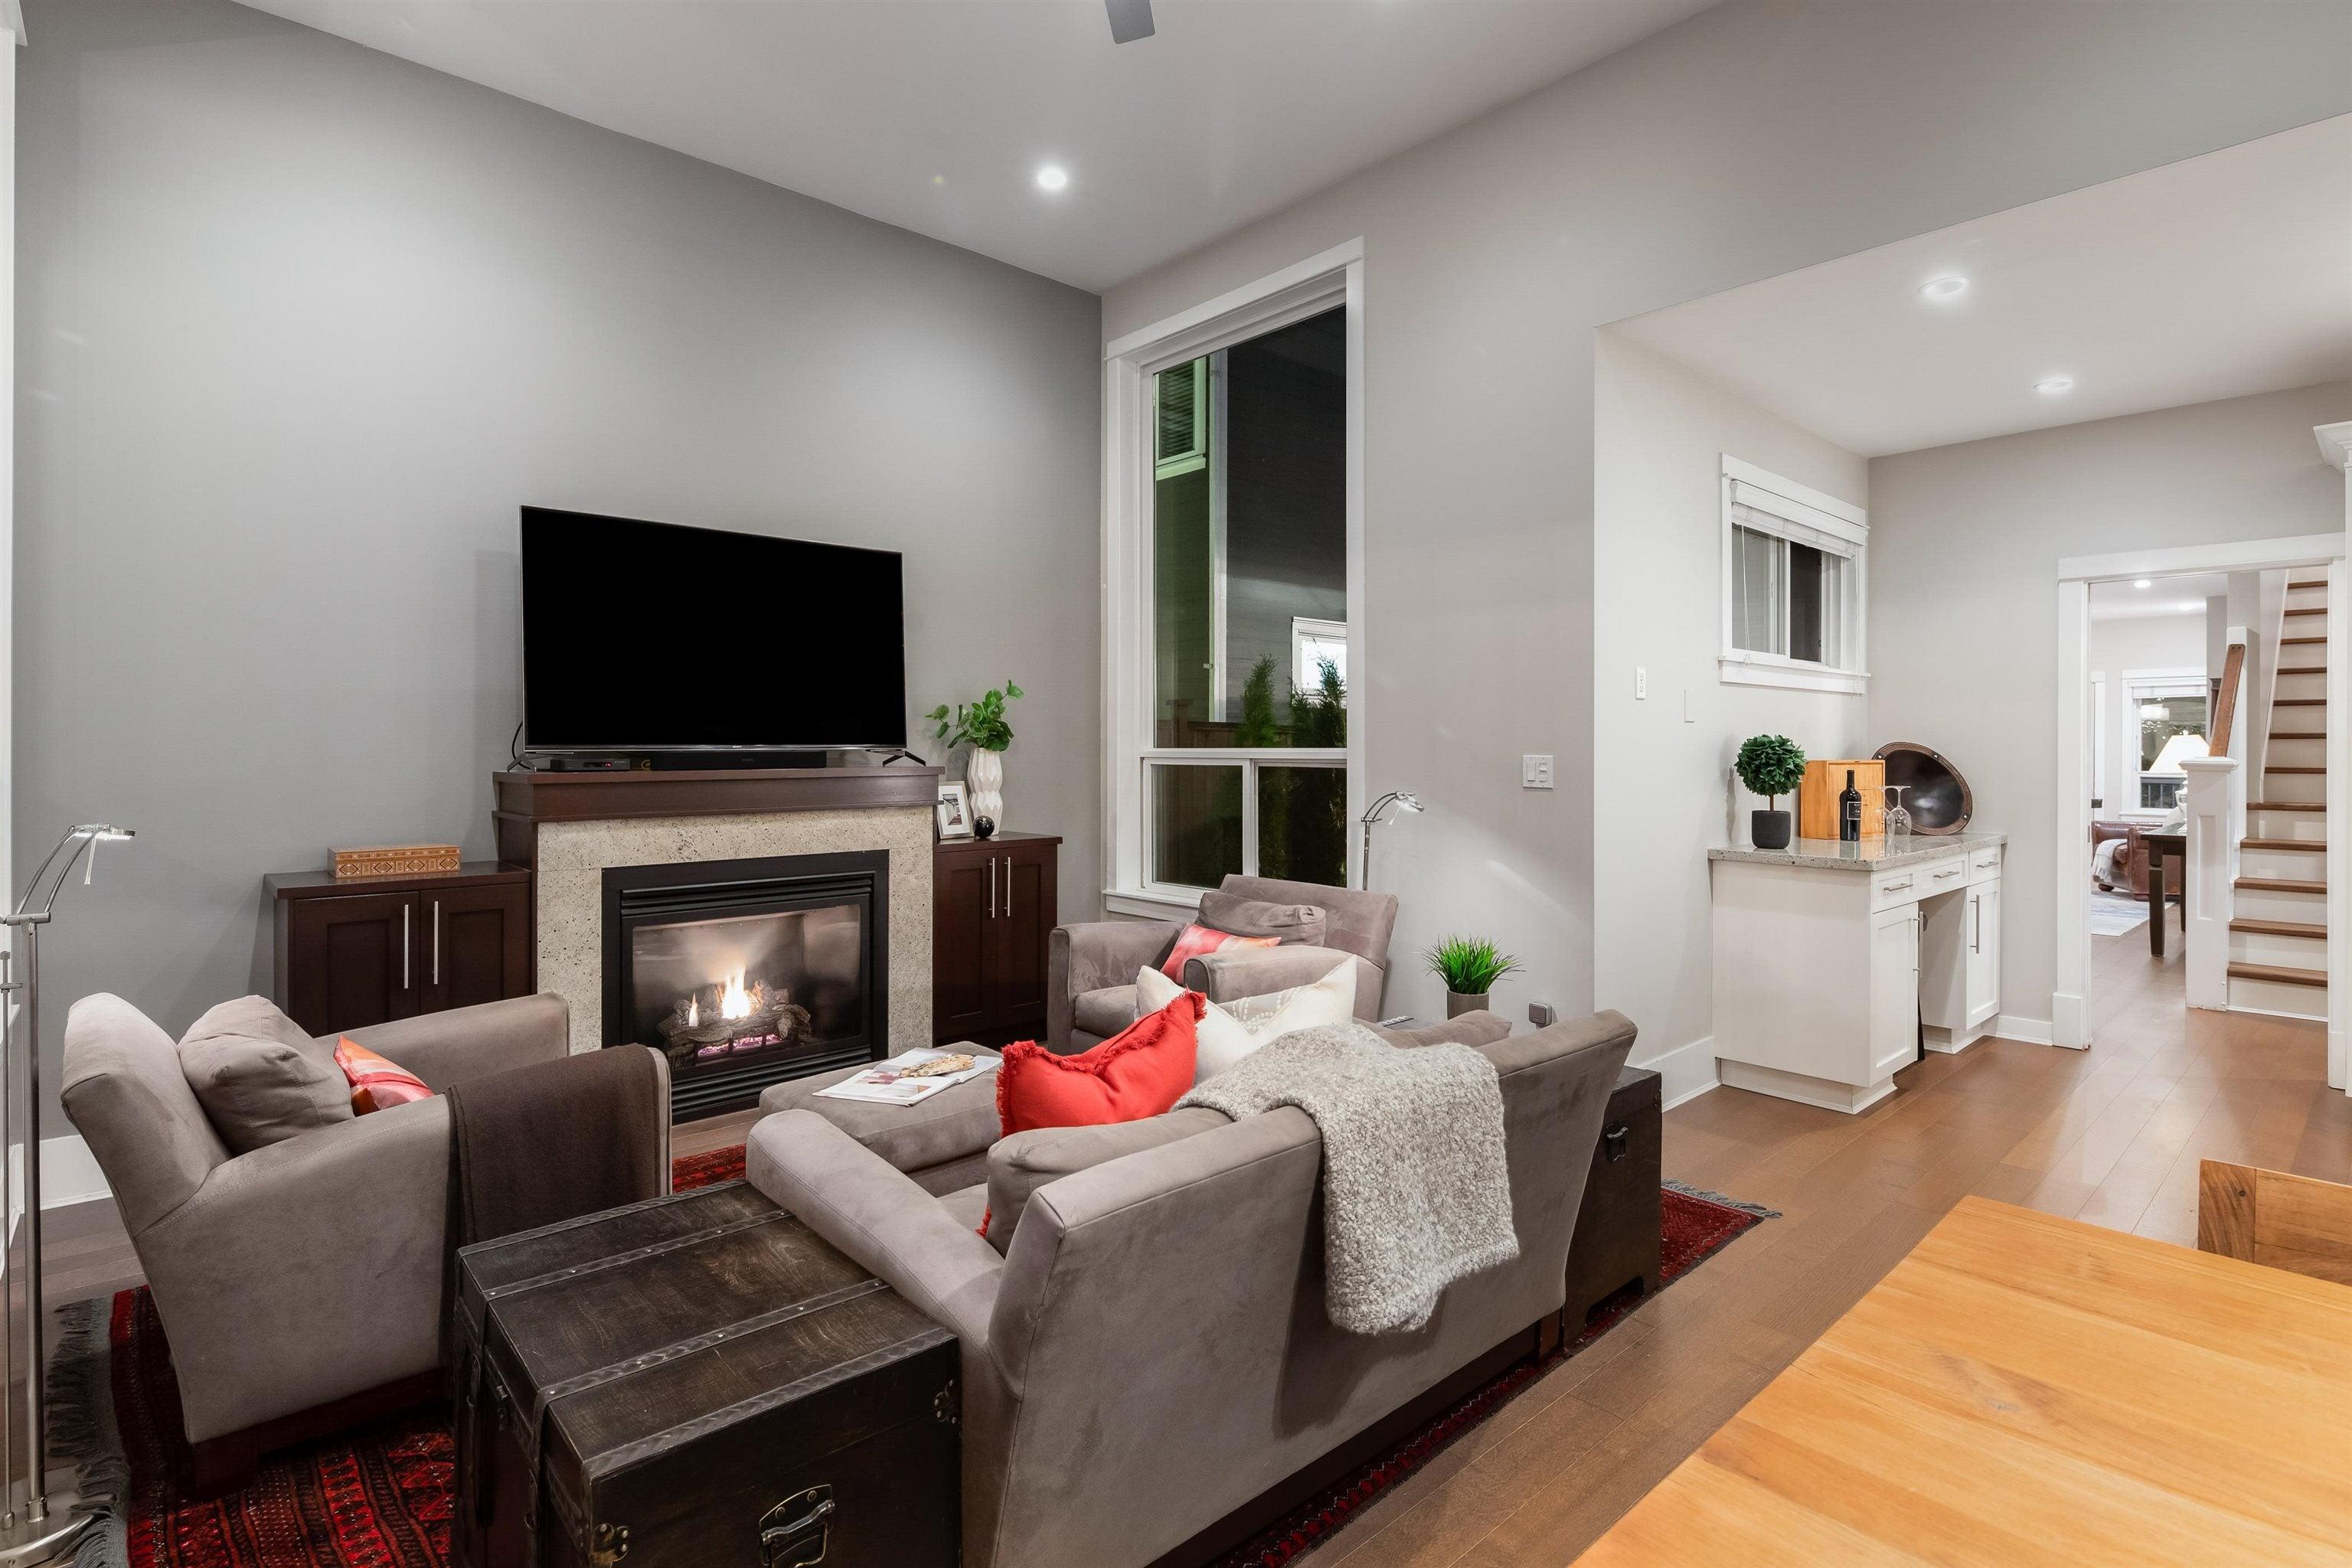 2258 WINDRIDGE DRIVE - Seymour NV House/Single Family for sale, 5 Bedrooms (R2617156) - #12